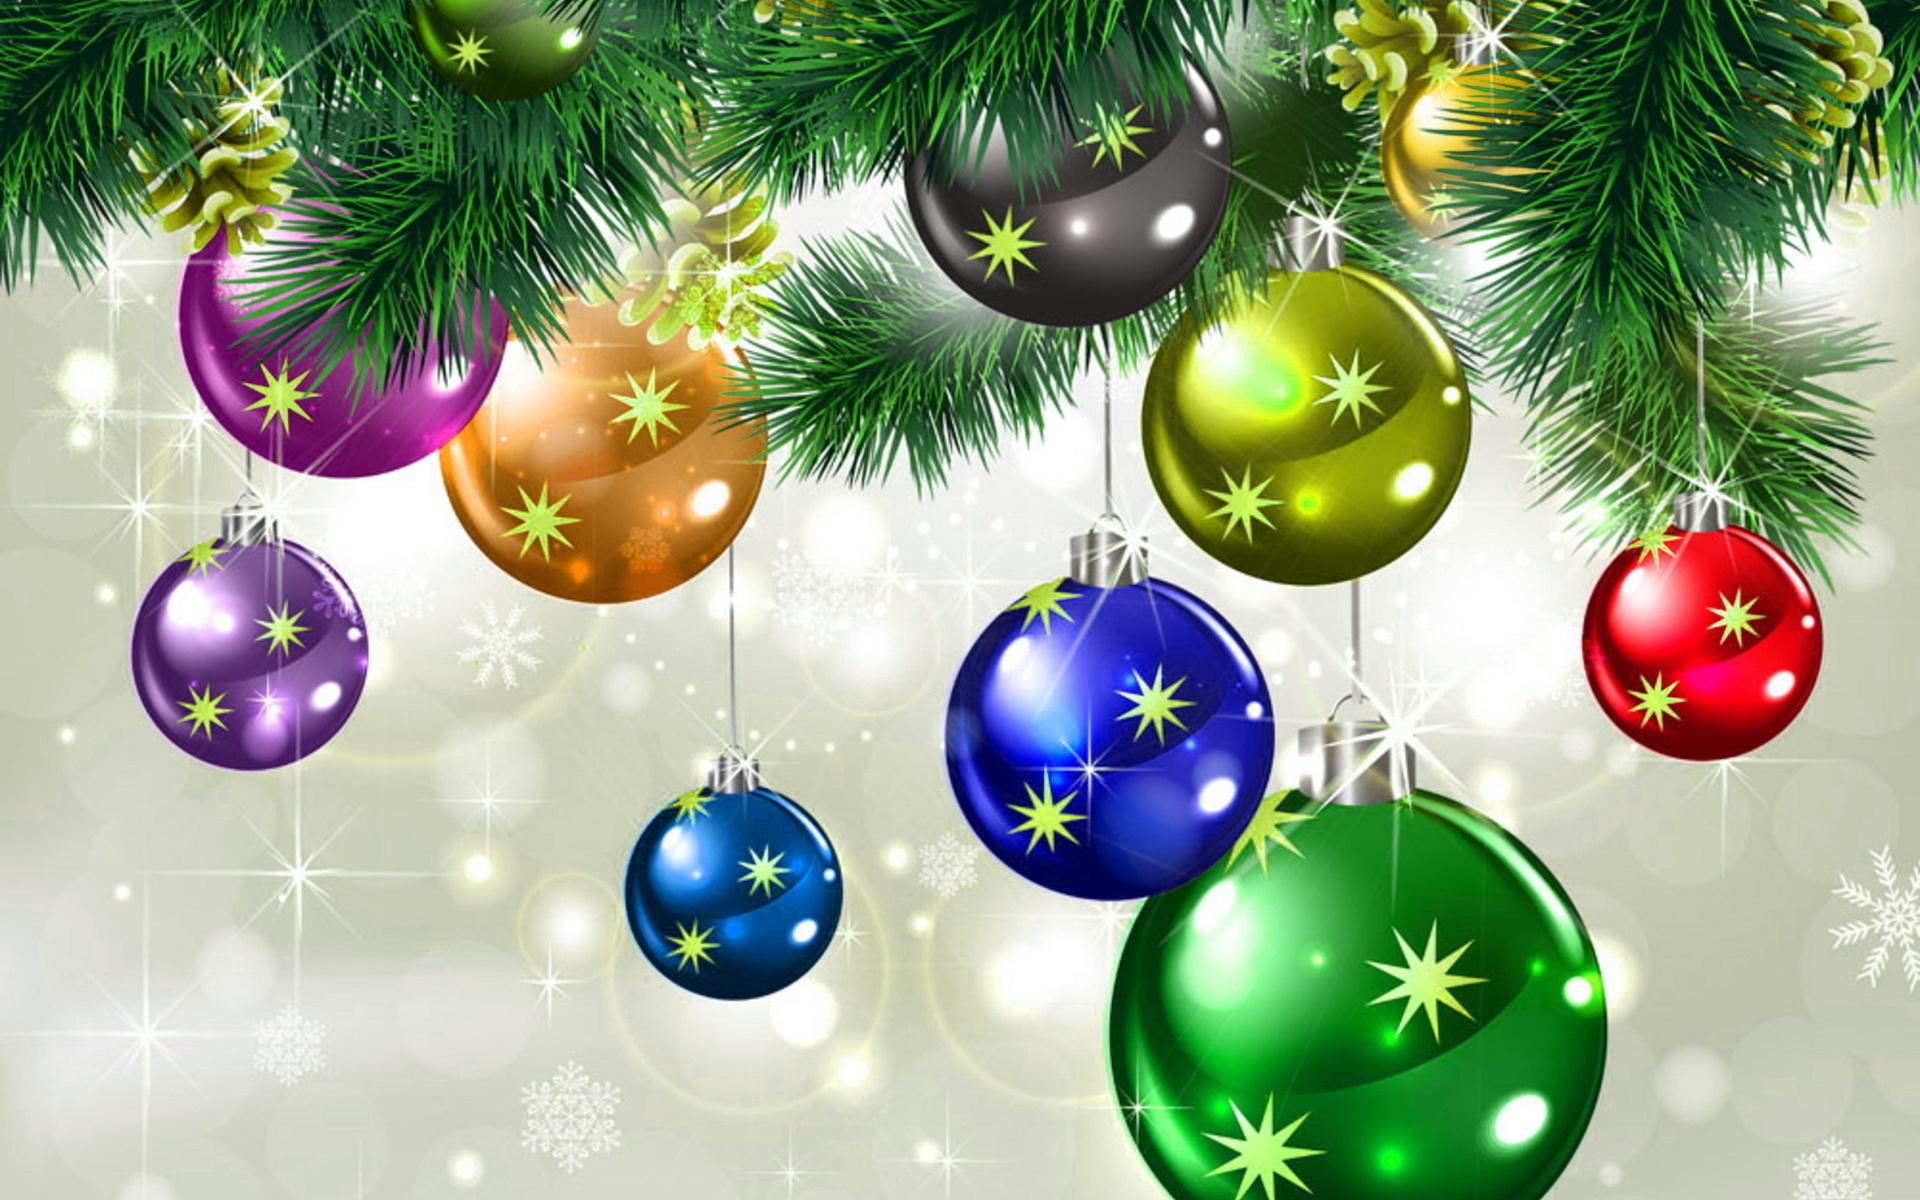 Картинки с шарами новогодними